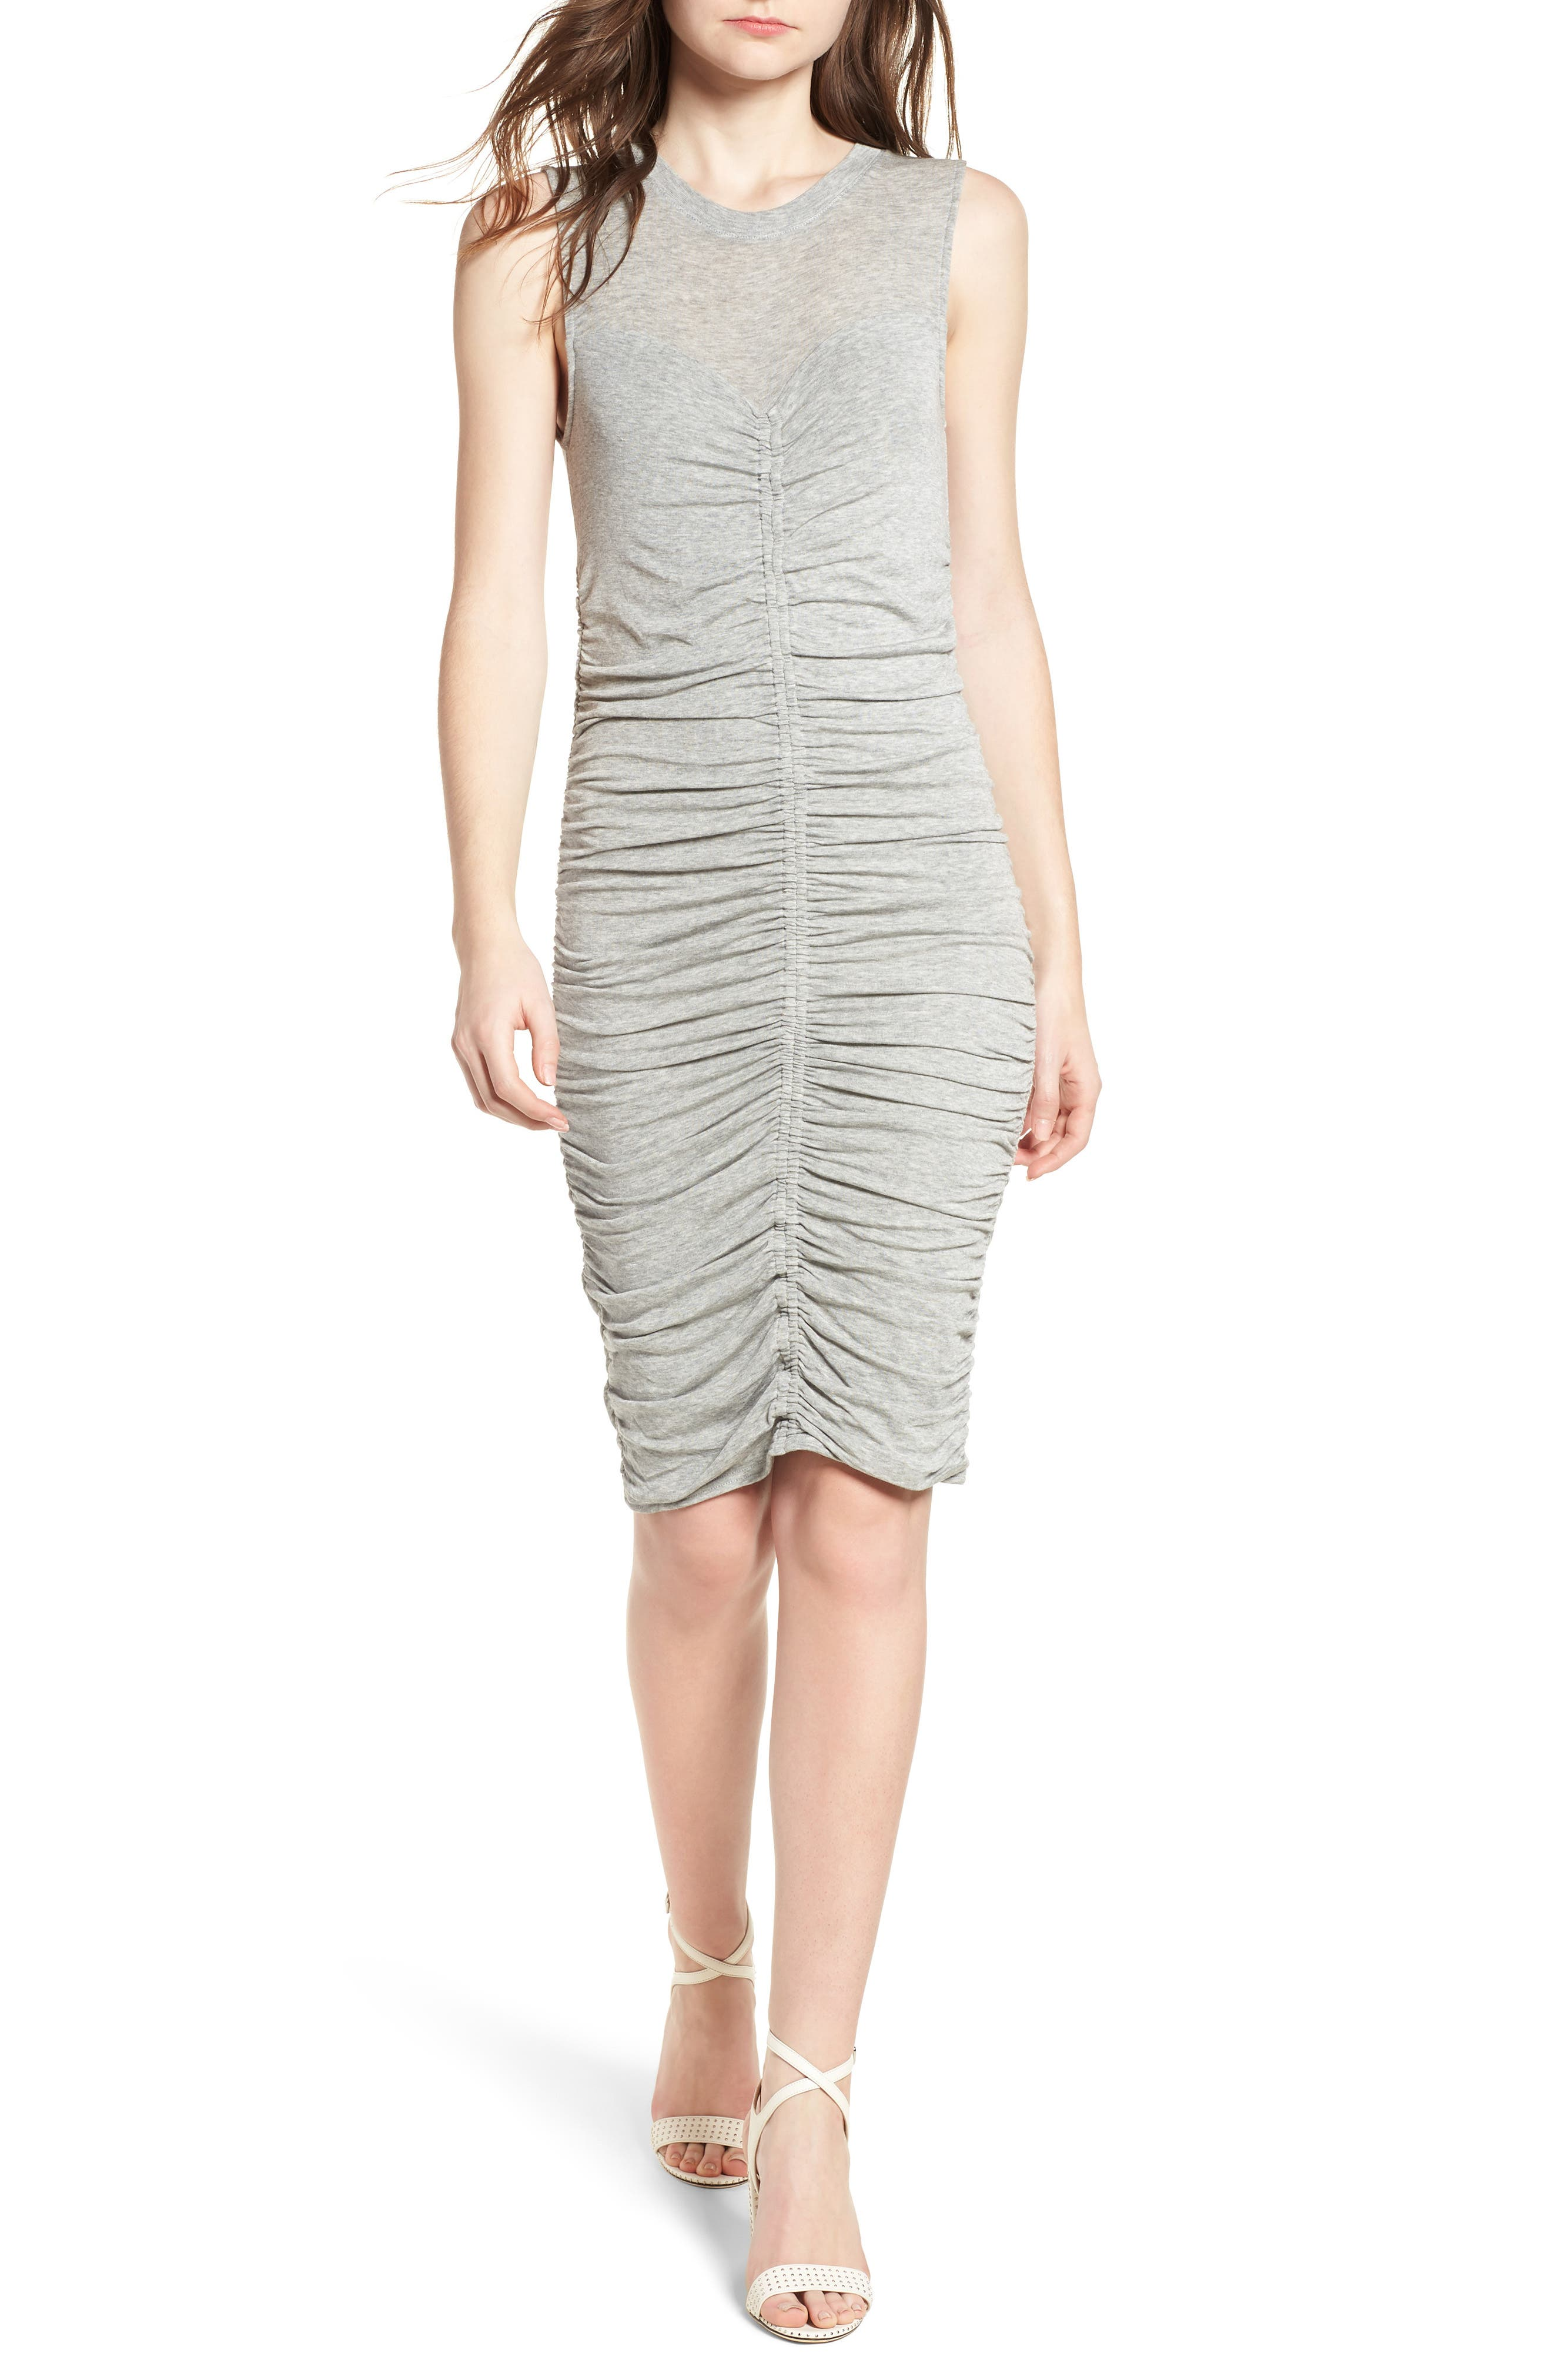 Trouvé Shirred Dress